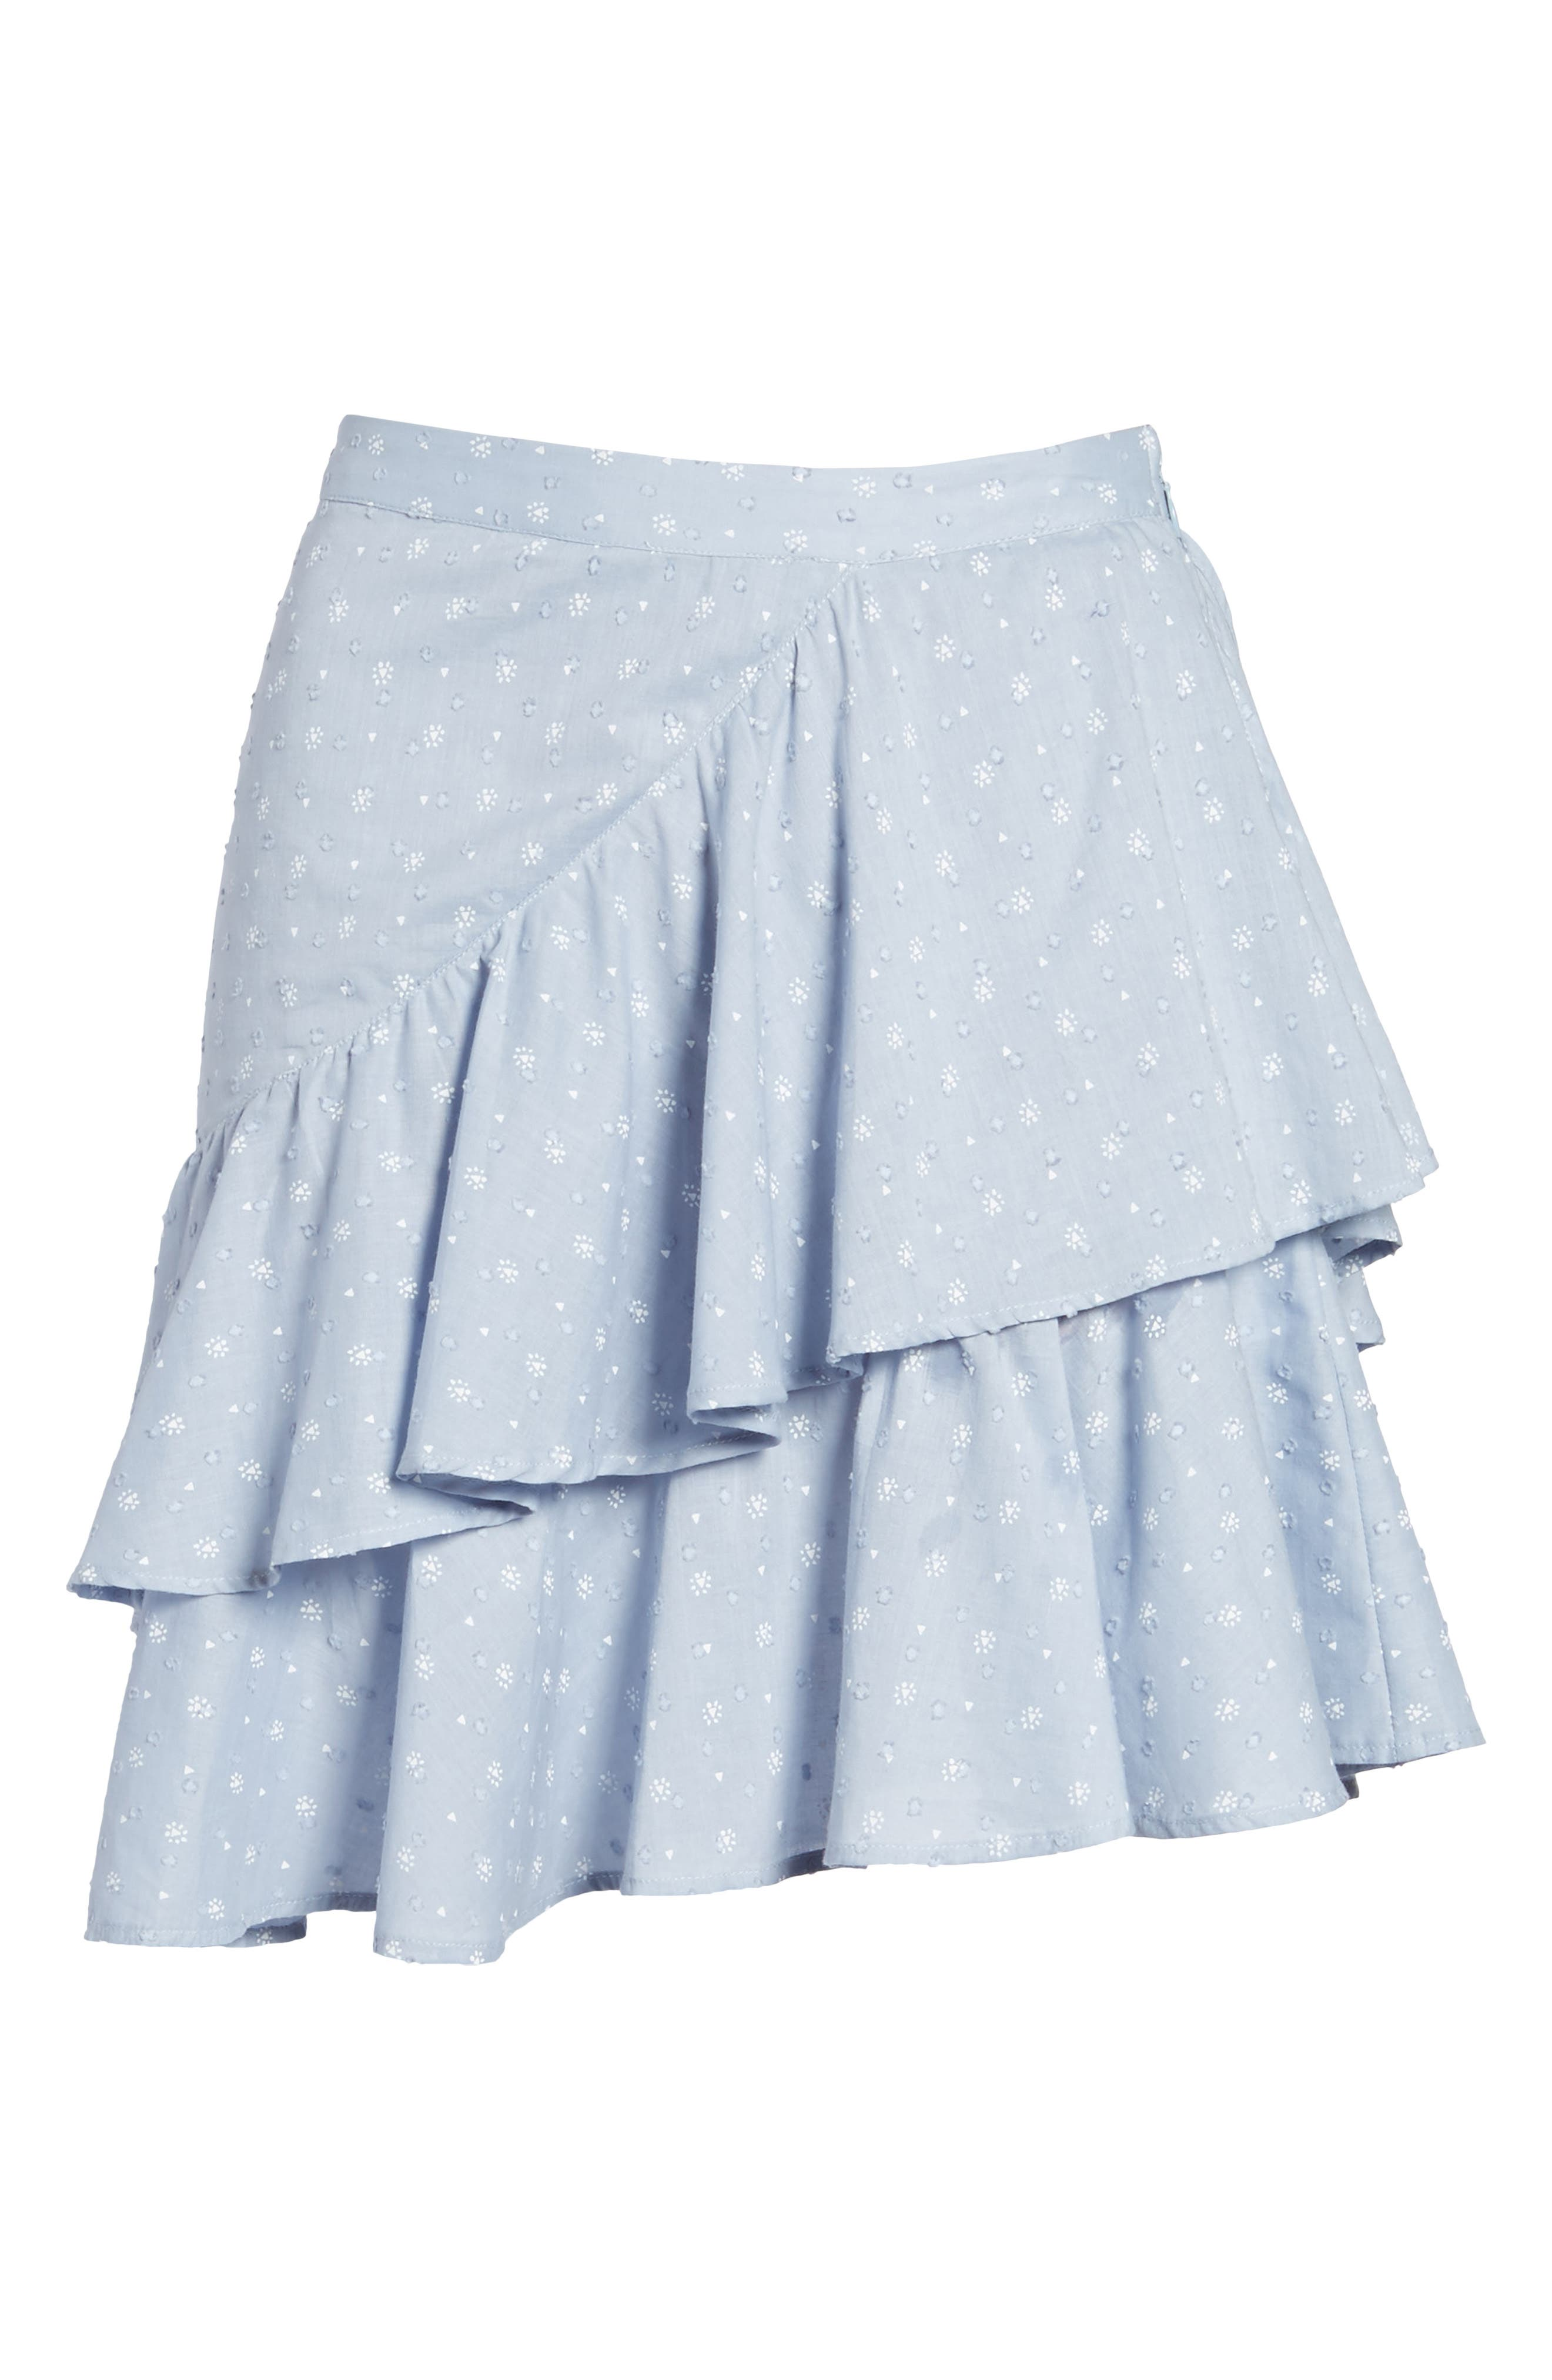 Mara Ruffled Miniskirt,                             Alternate thumbnail 7, color,                             Sail Blue